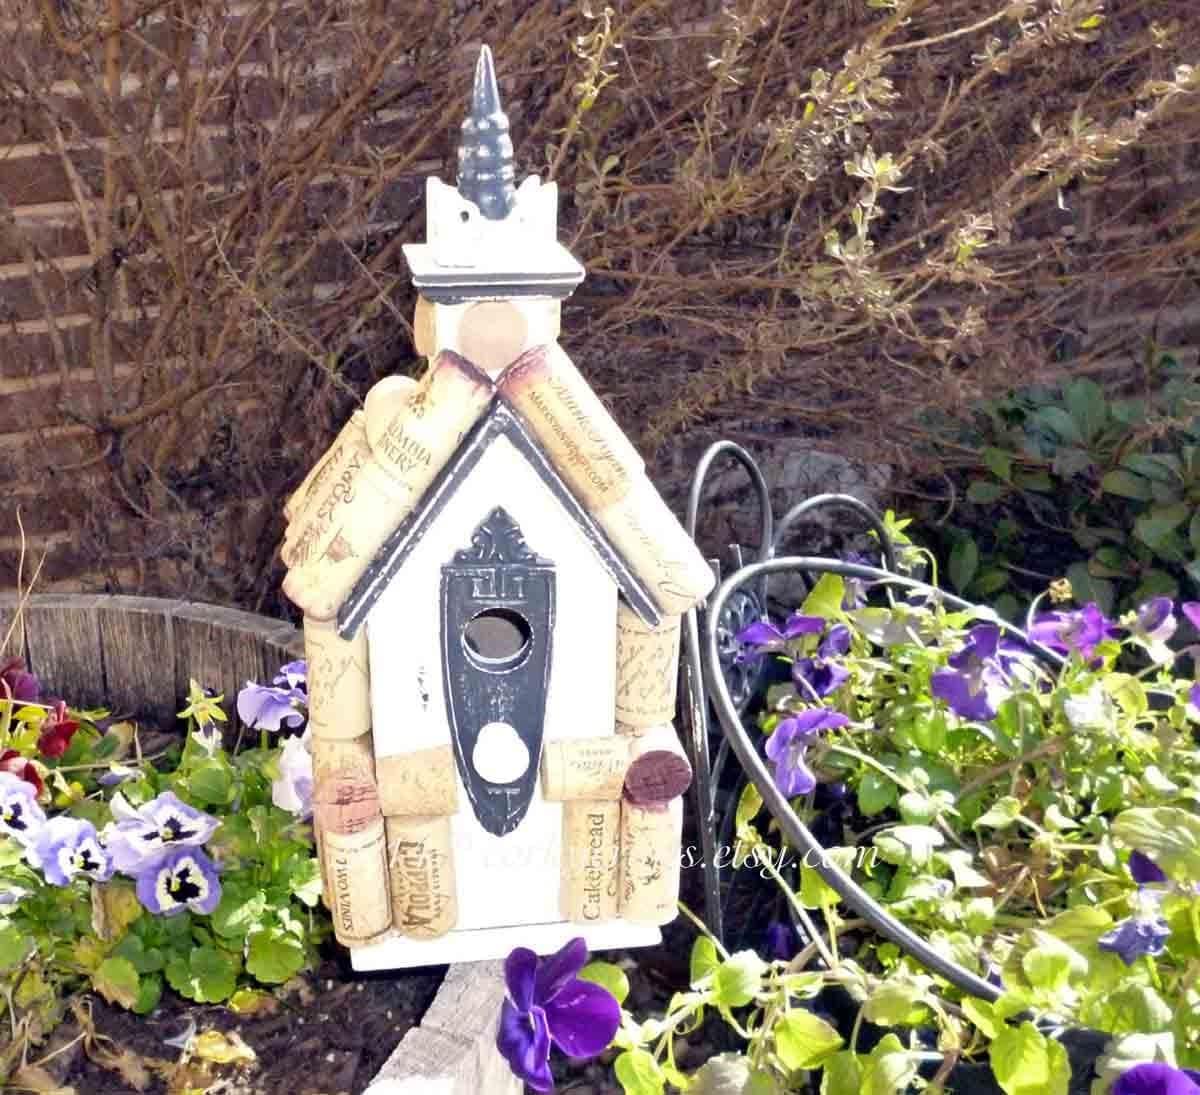 Wine cork bird house, wine tweet retreat for your feathered friends - Corkycrafts